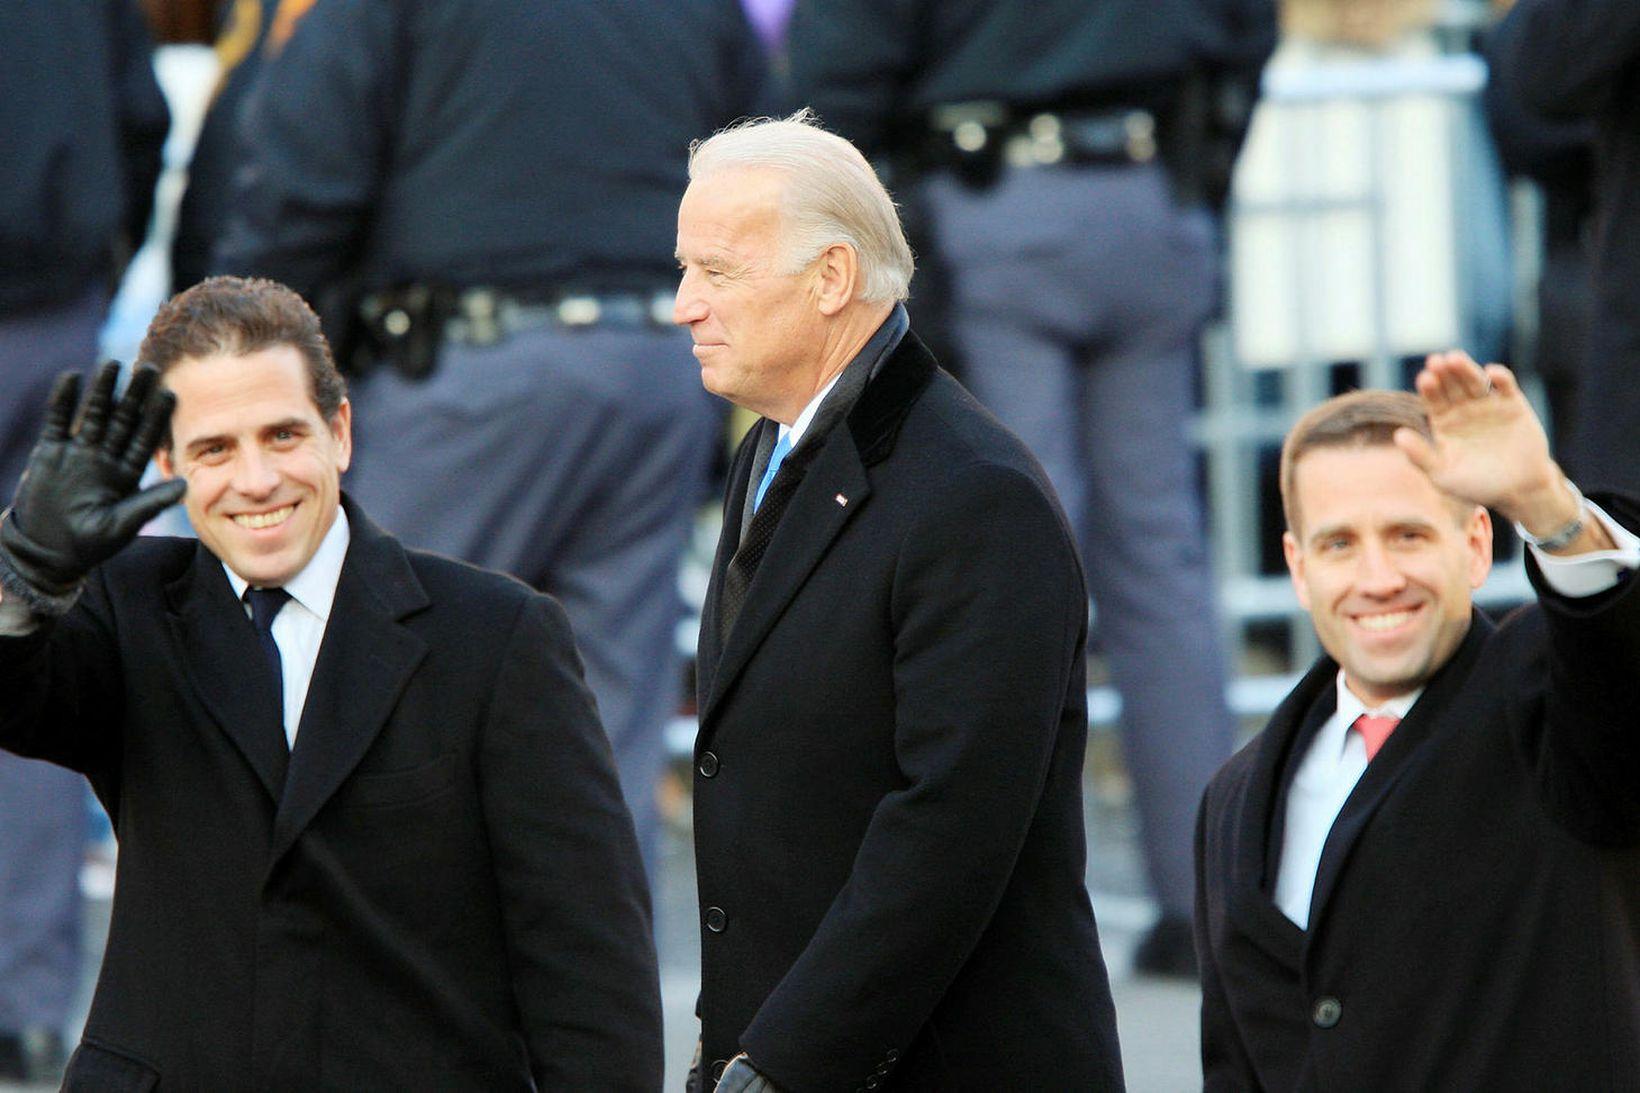 Frá vinstri: Hunter Biden, Joe Biden og Beau Biden.